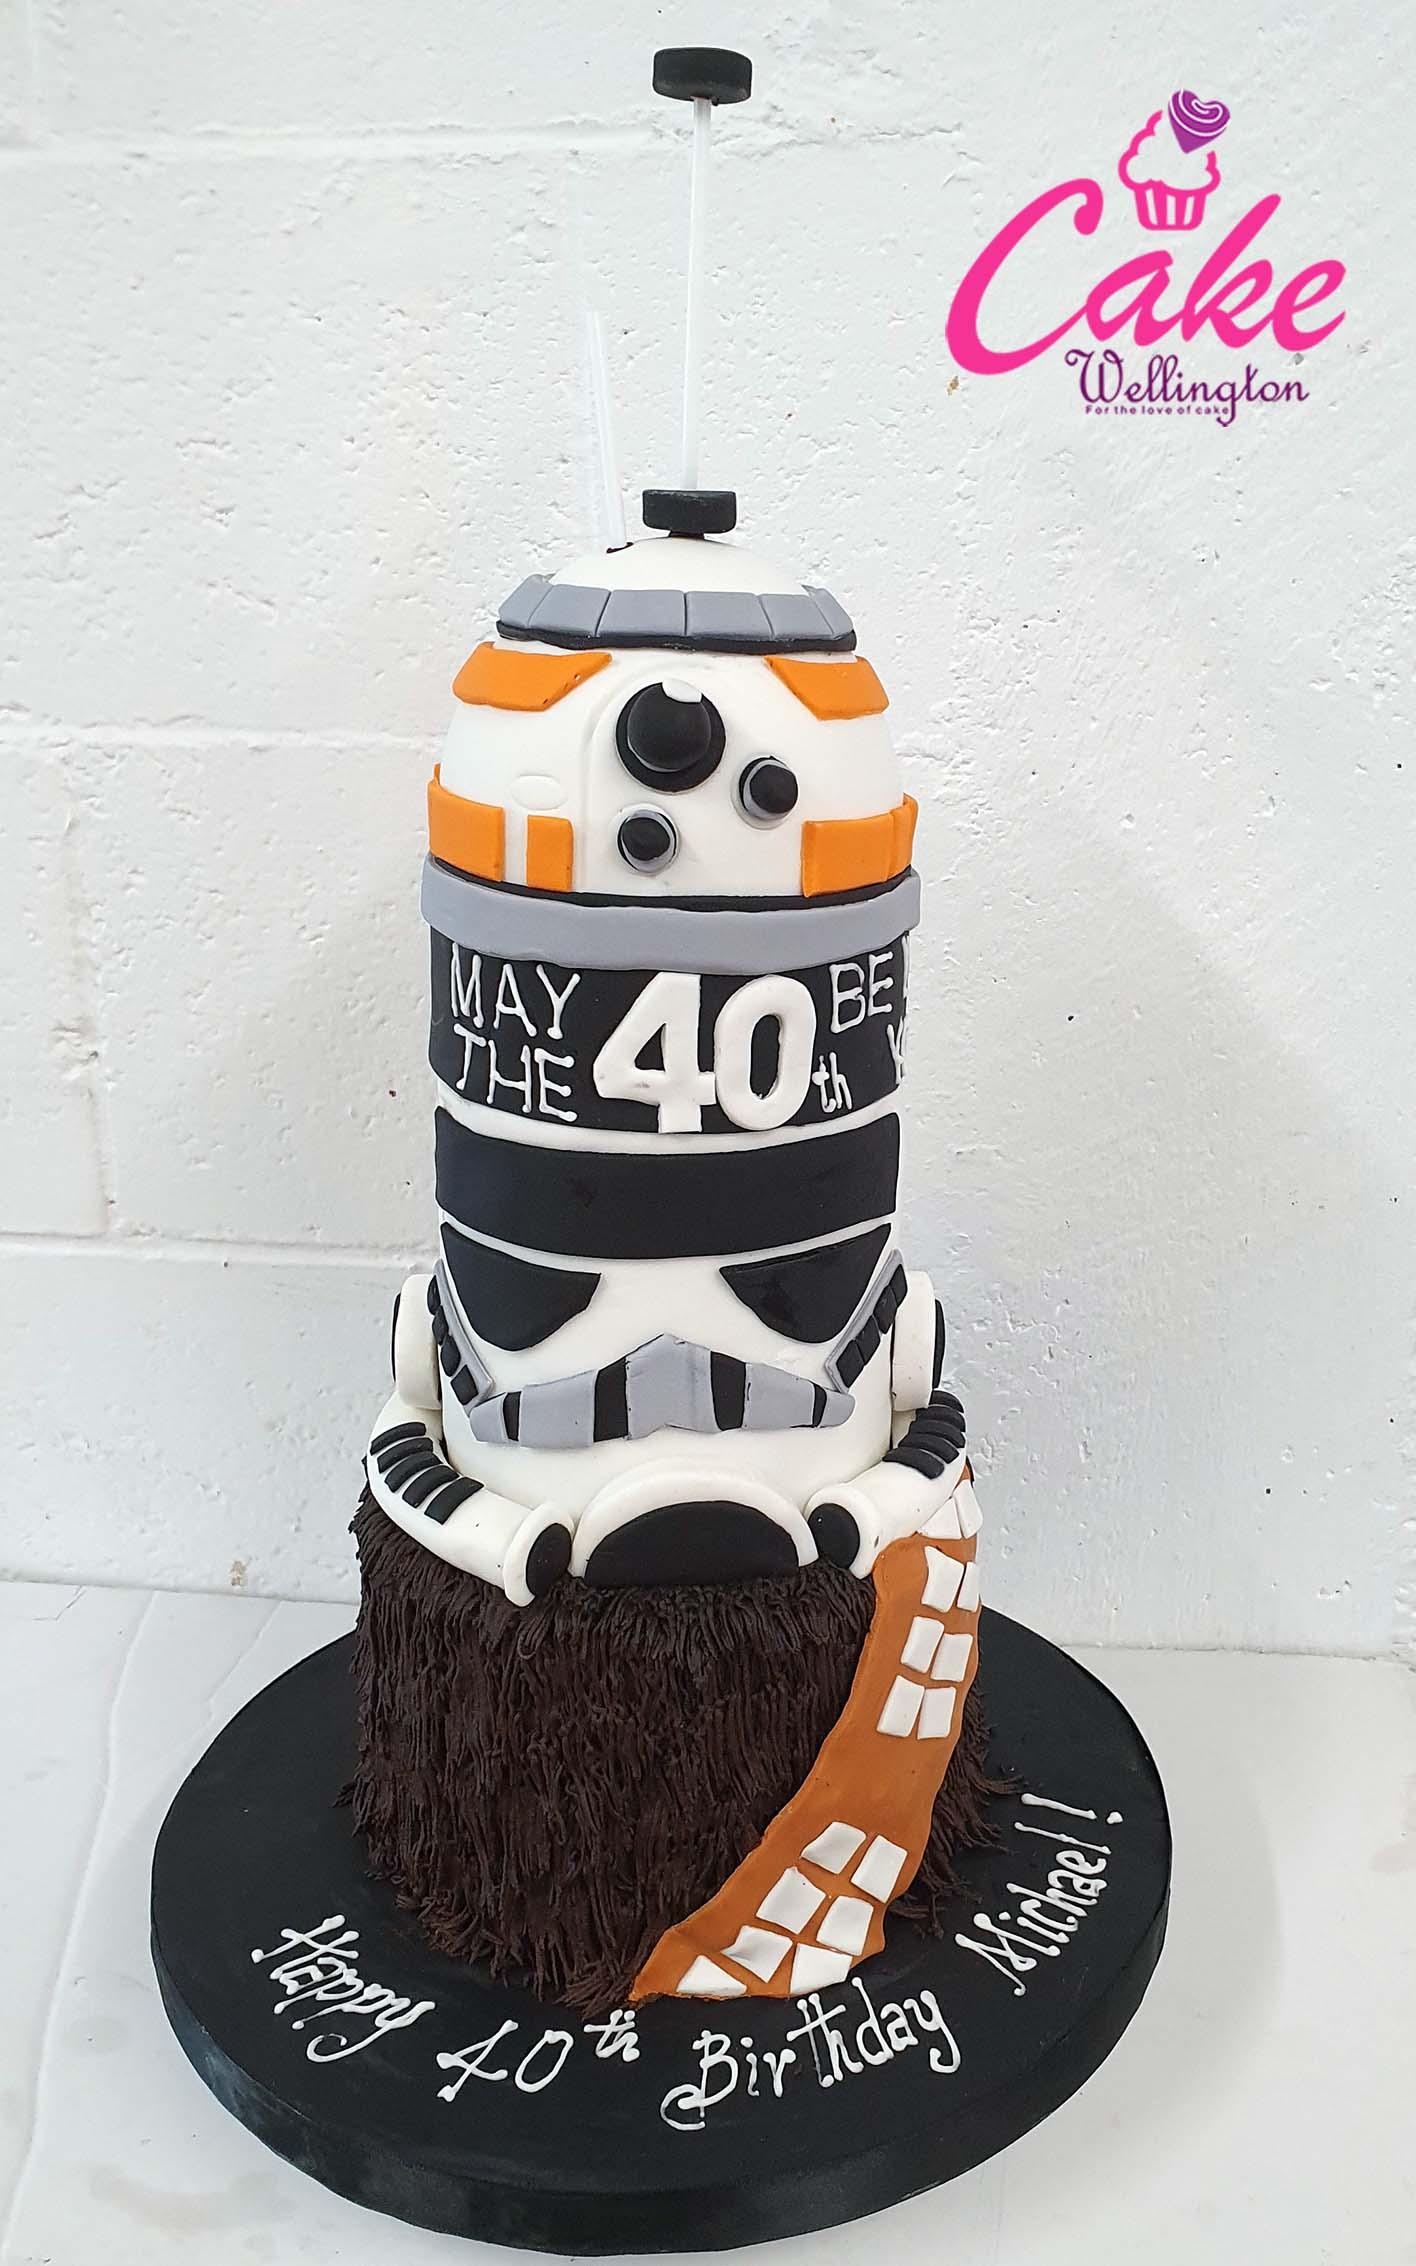 Fabulous 11 40Th Birthday Cake Cake Wellington Funny Birthday Cards Online Alyptdamsfinfo